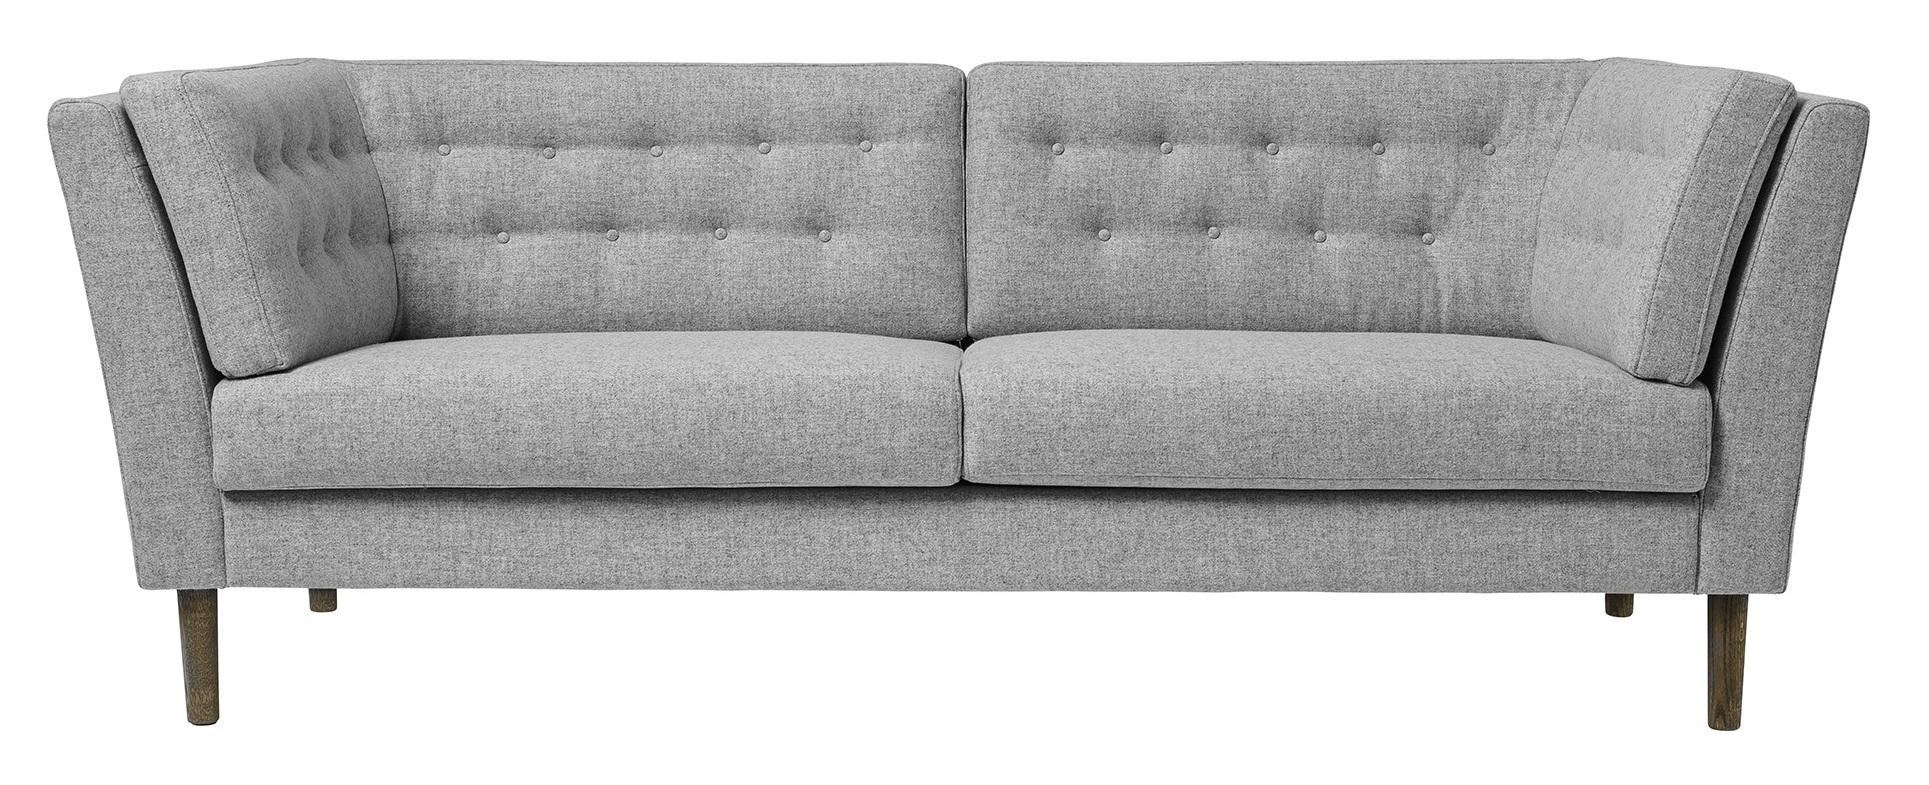 Pause soffa